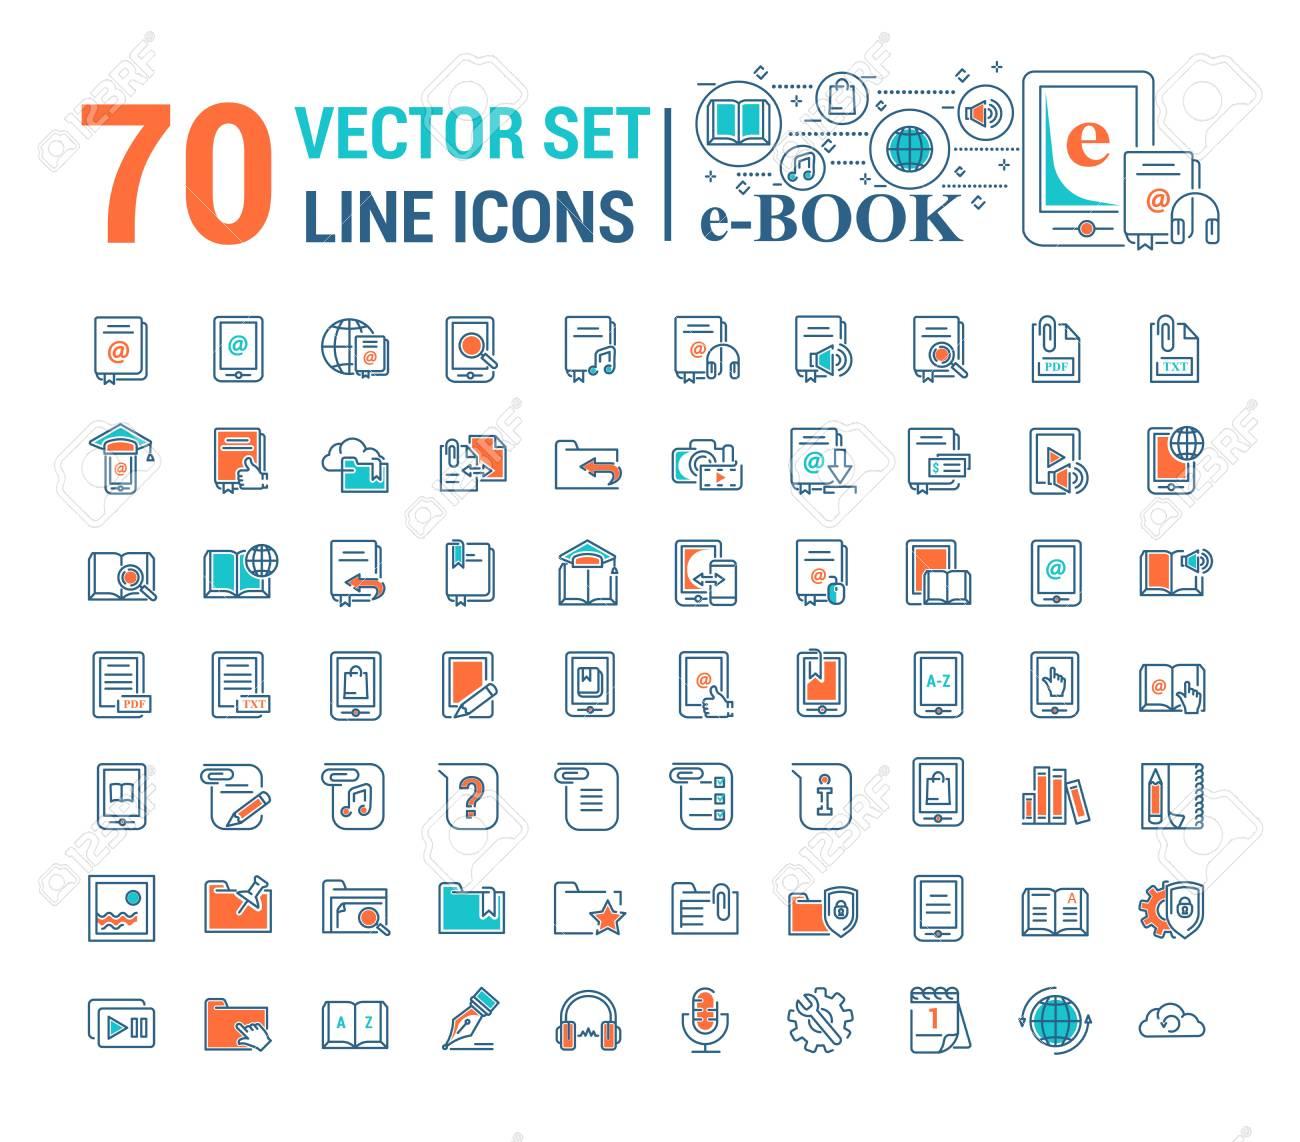 Vector graphic set.Logo, icon. E-book, pocket book. Linear, flat, contour, thin design. App, Template, infographic. Symbol, element, emblem, smart technologies. Modern gadget online library education. - 126340136